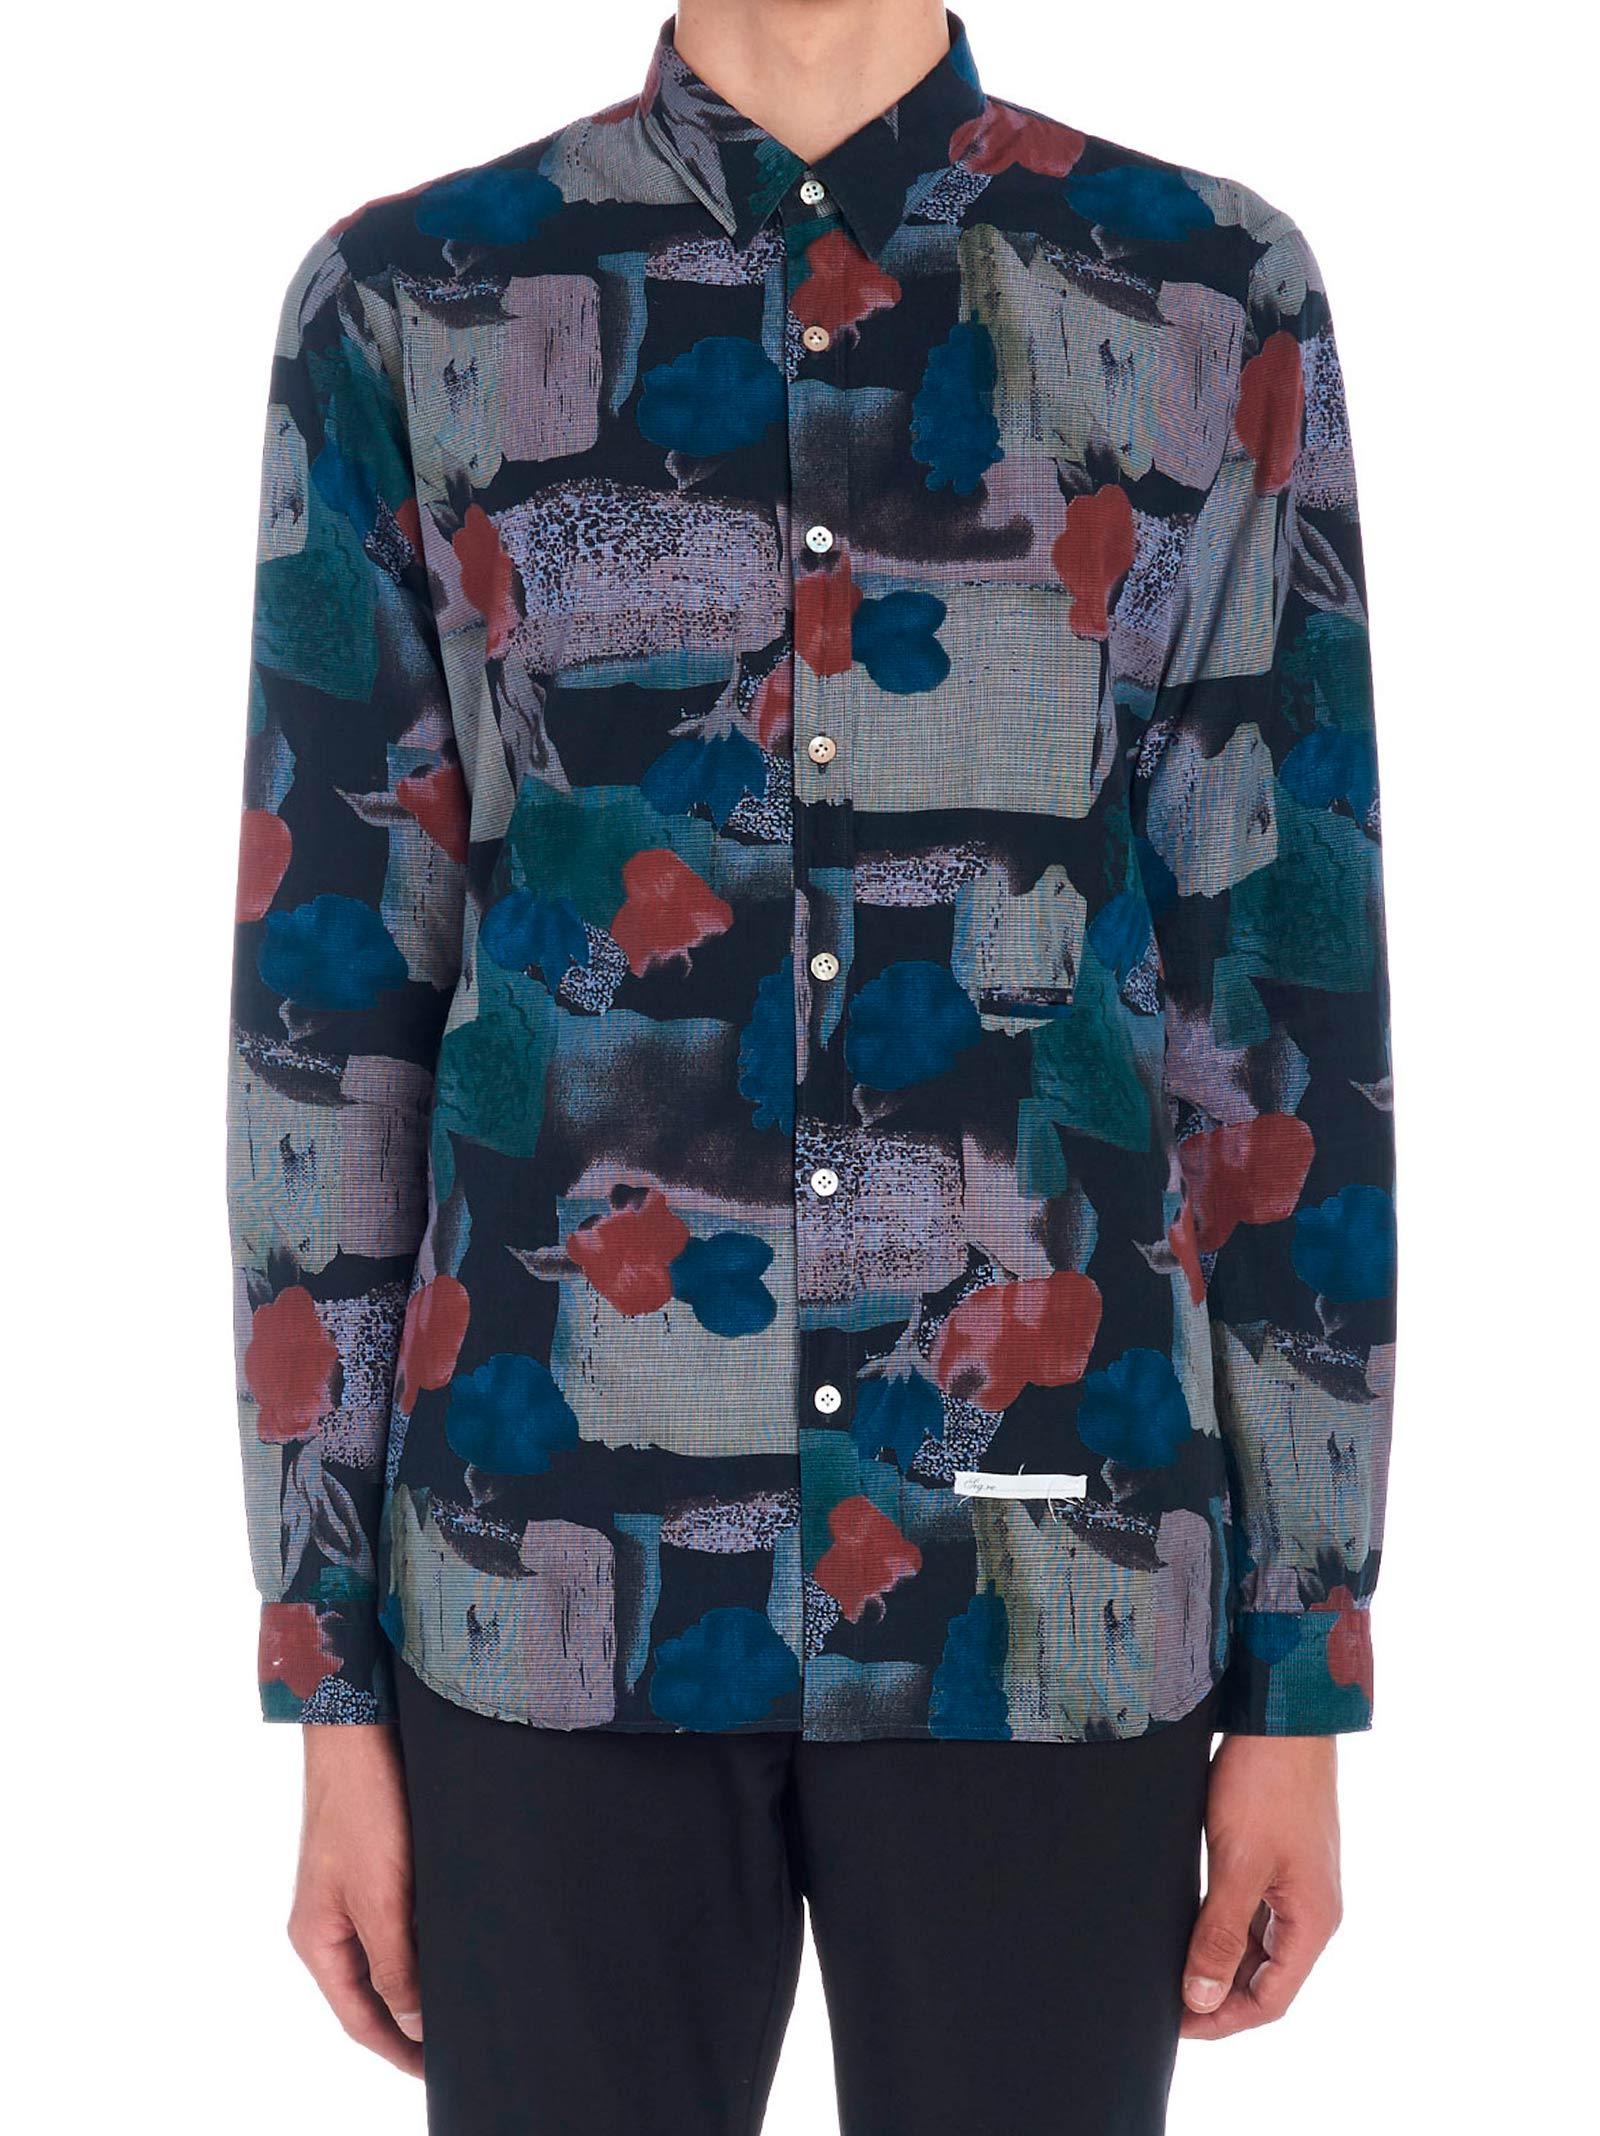 DNL Dnl Shirt in Multicolor